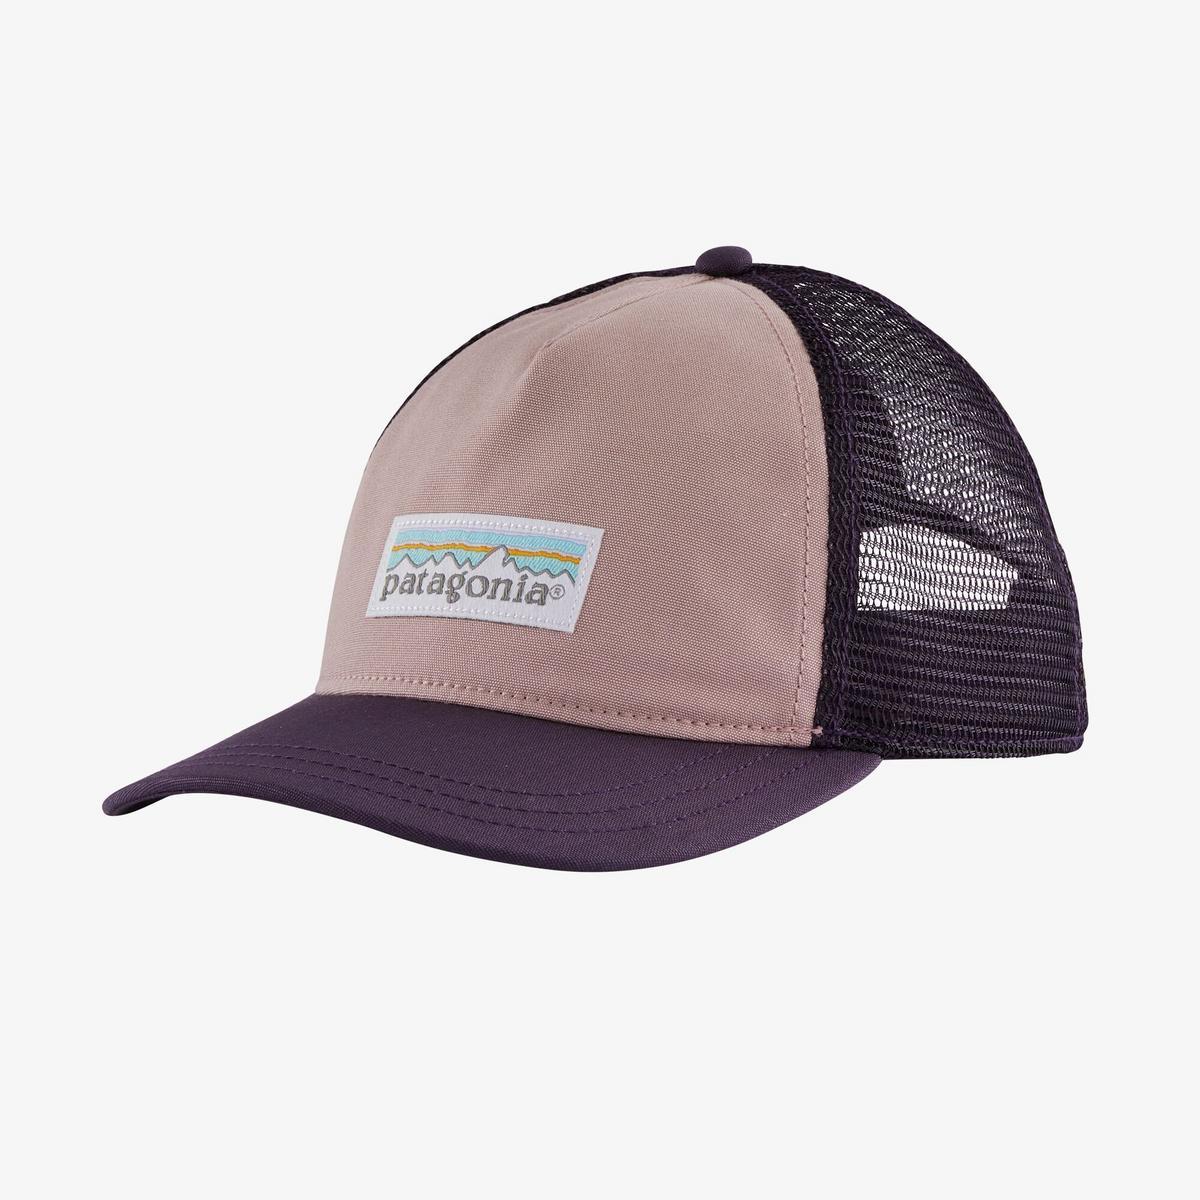 Patagonia Women's Pastel P6 Layback Truck Hat - Hazy Purple